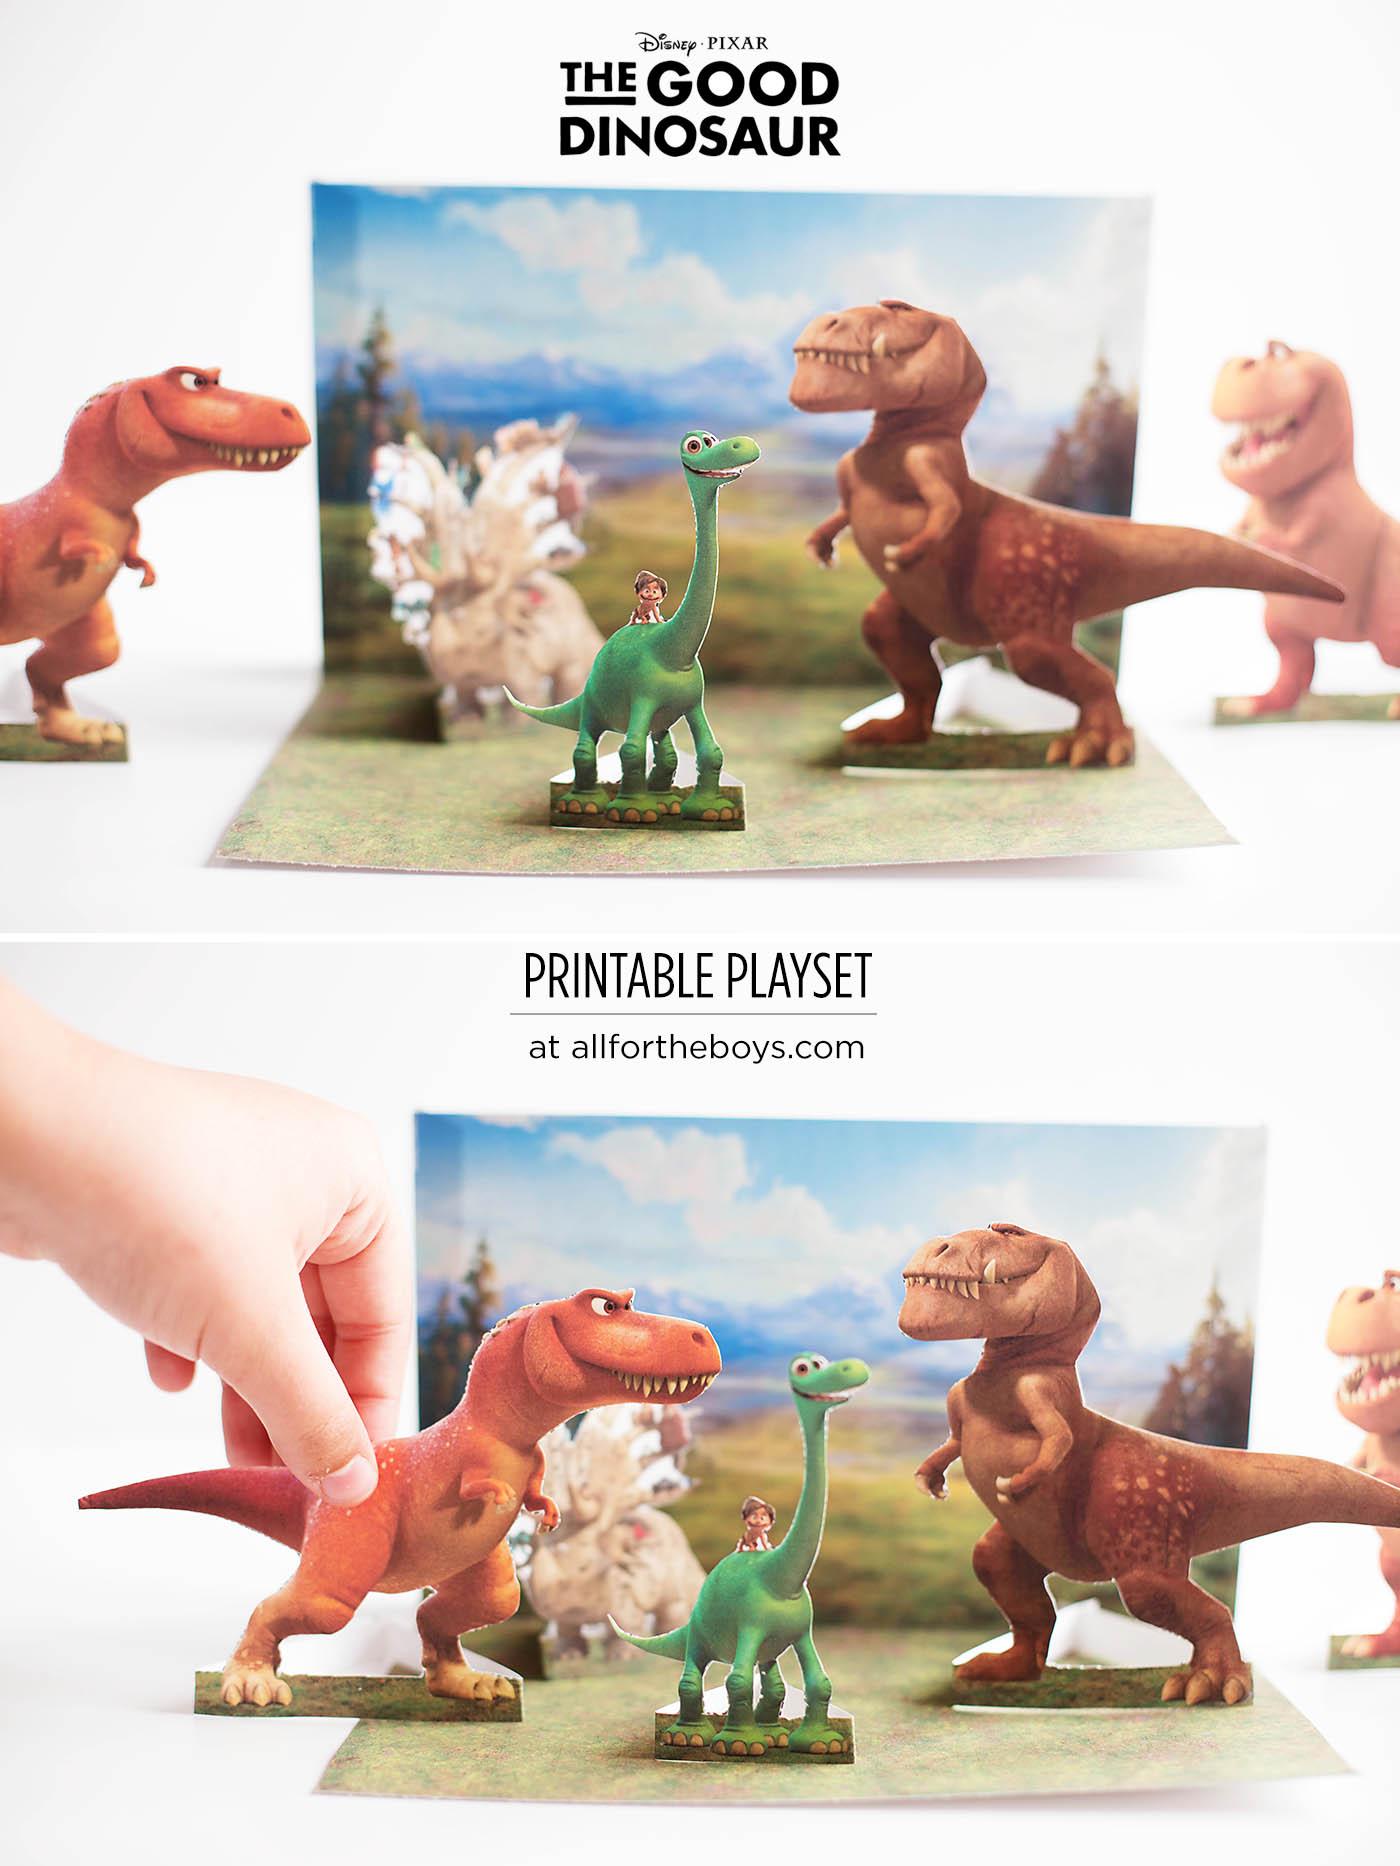 Free printable The Good Dinosaur playset and game!